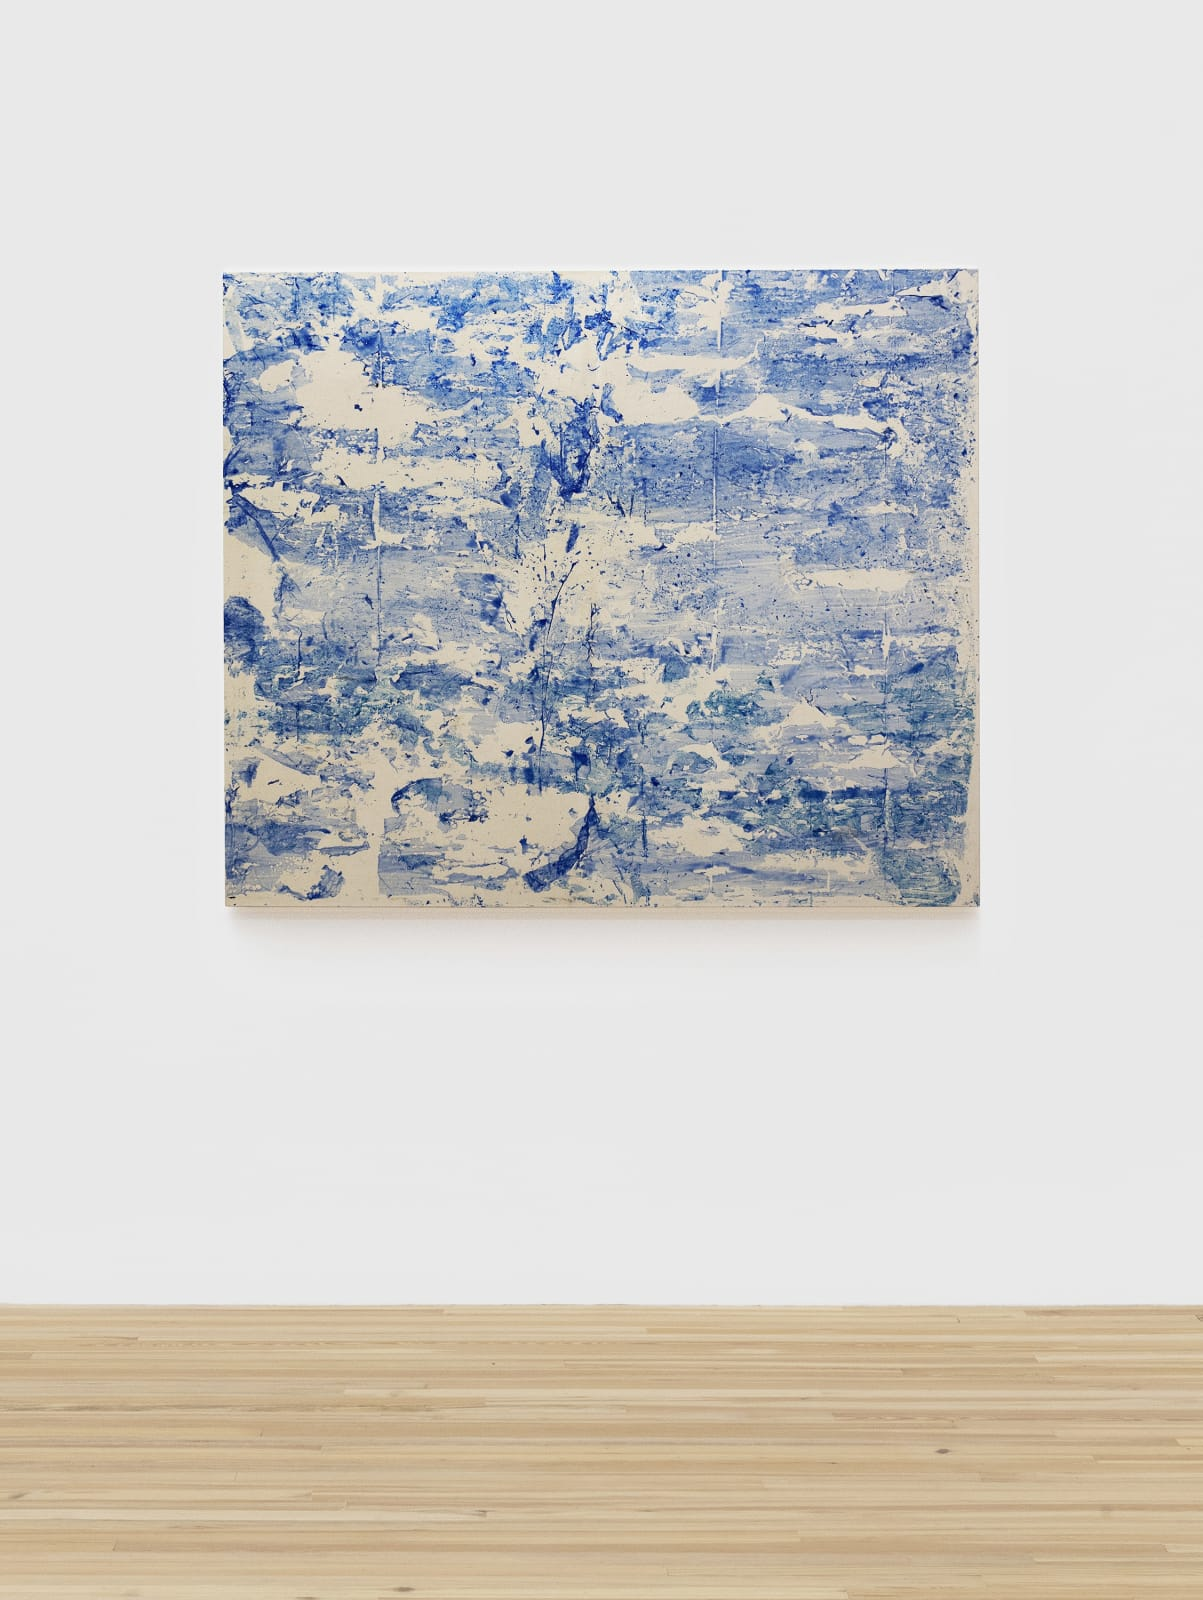 Padraig Timoney Untitled (Blue), 2019 Acrylic and rabbitskin glue on canvas 54 1/8 x 64 1/8 x 1 1/2 in (137.5 x 162.9 x 3.8 cm)